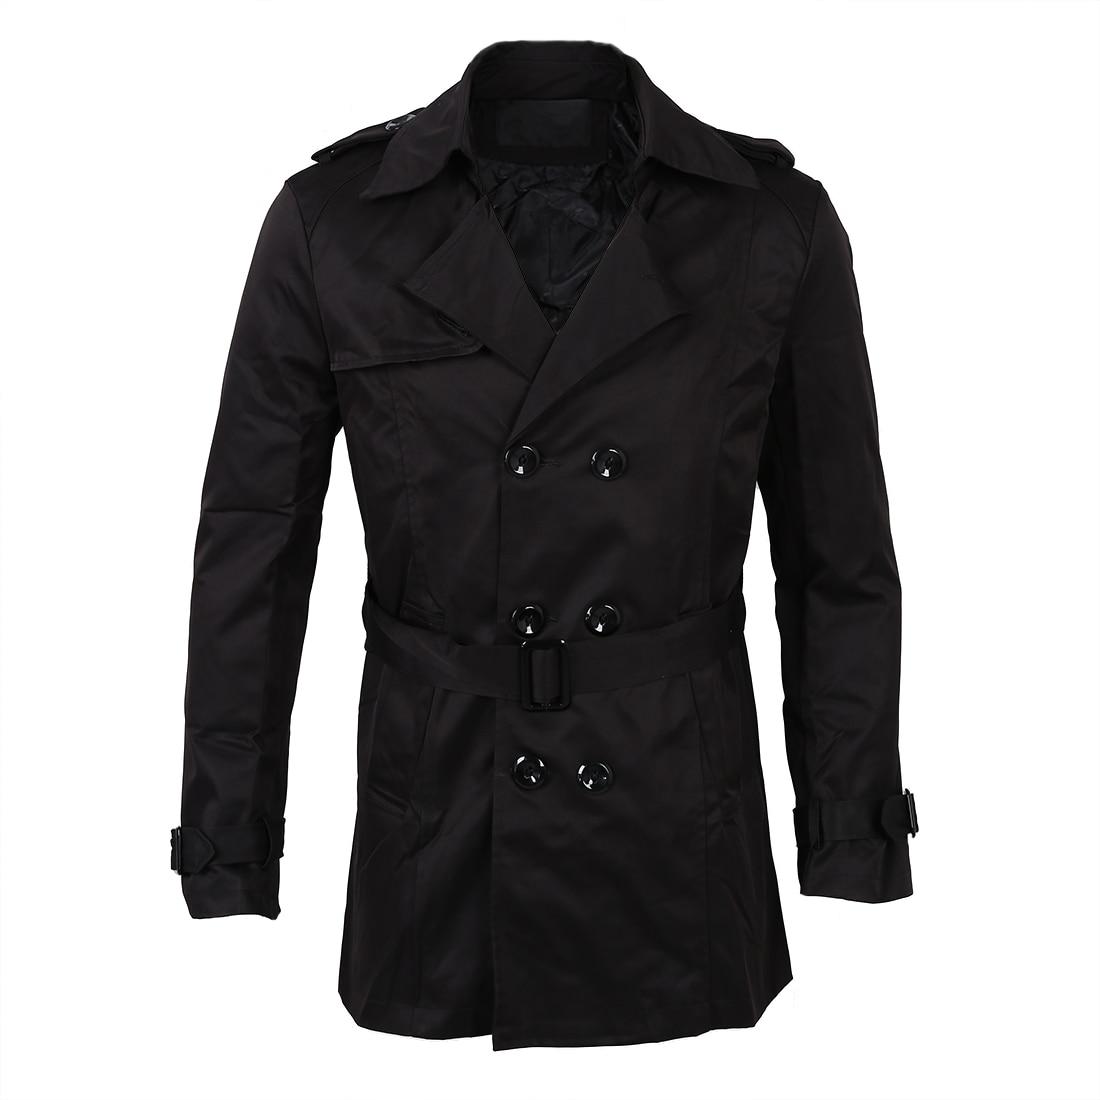 Men Winter Slim Double Breasted Trench Coat Long Jacket Overcoat Outwear Black Size M/US XS